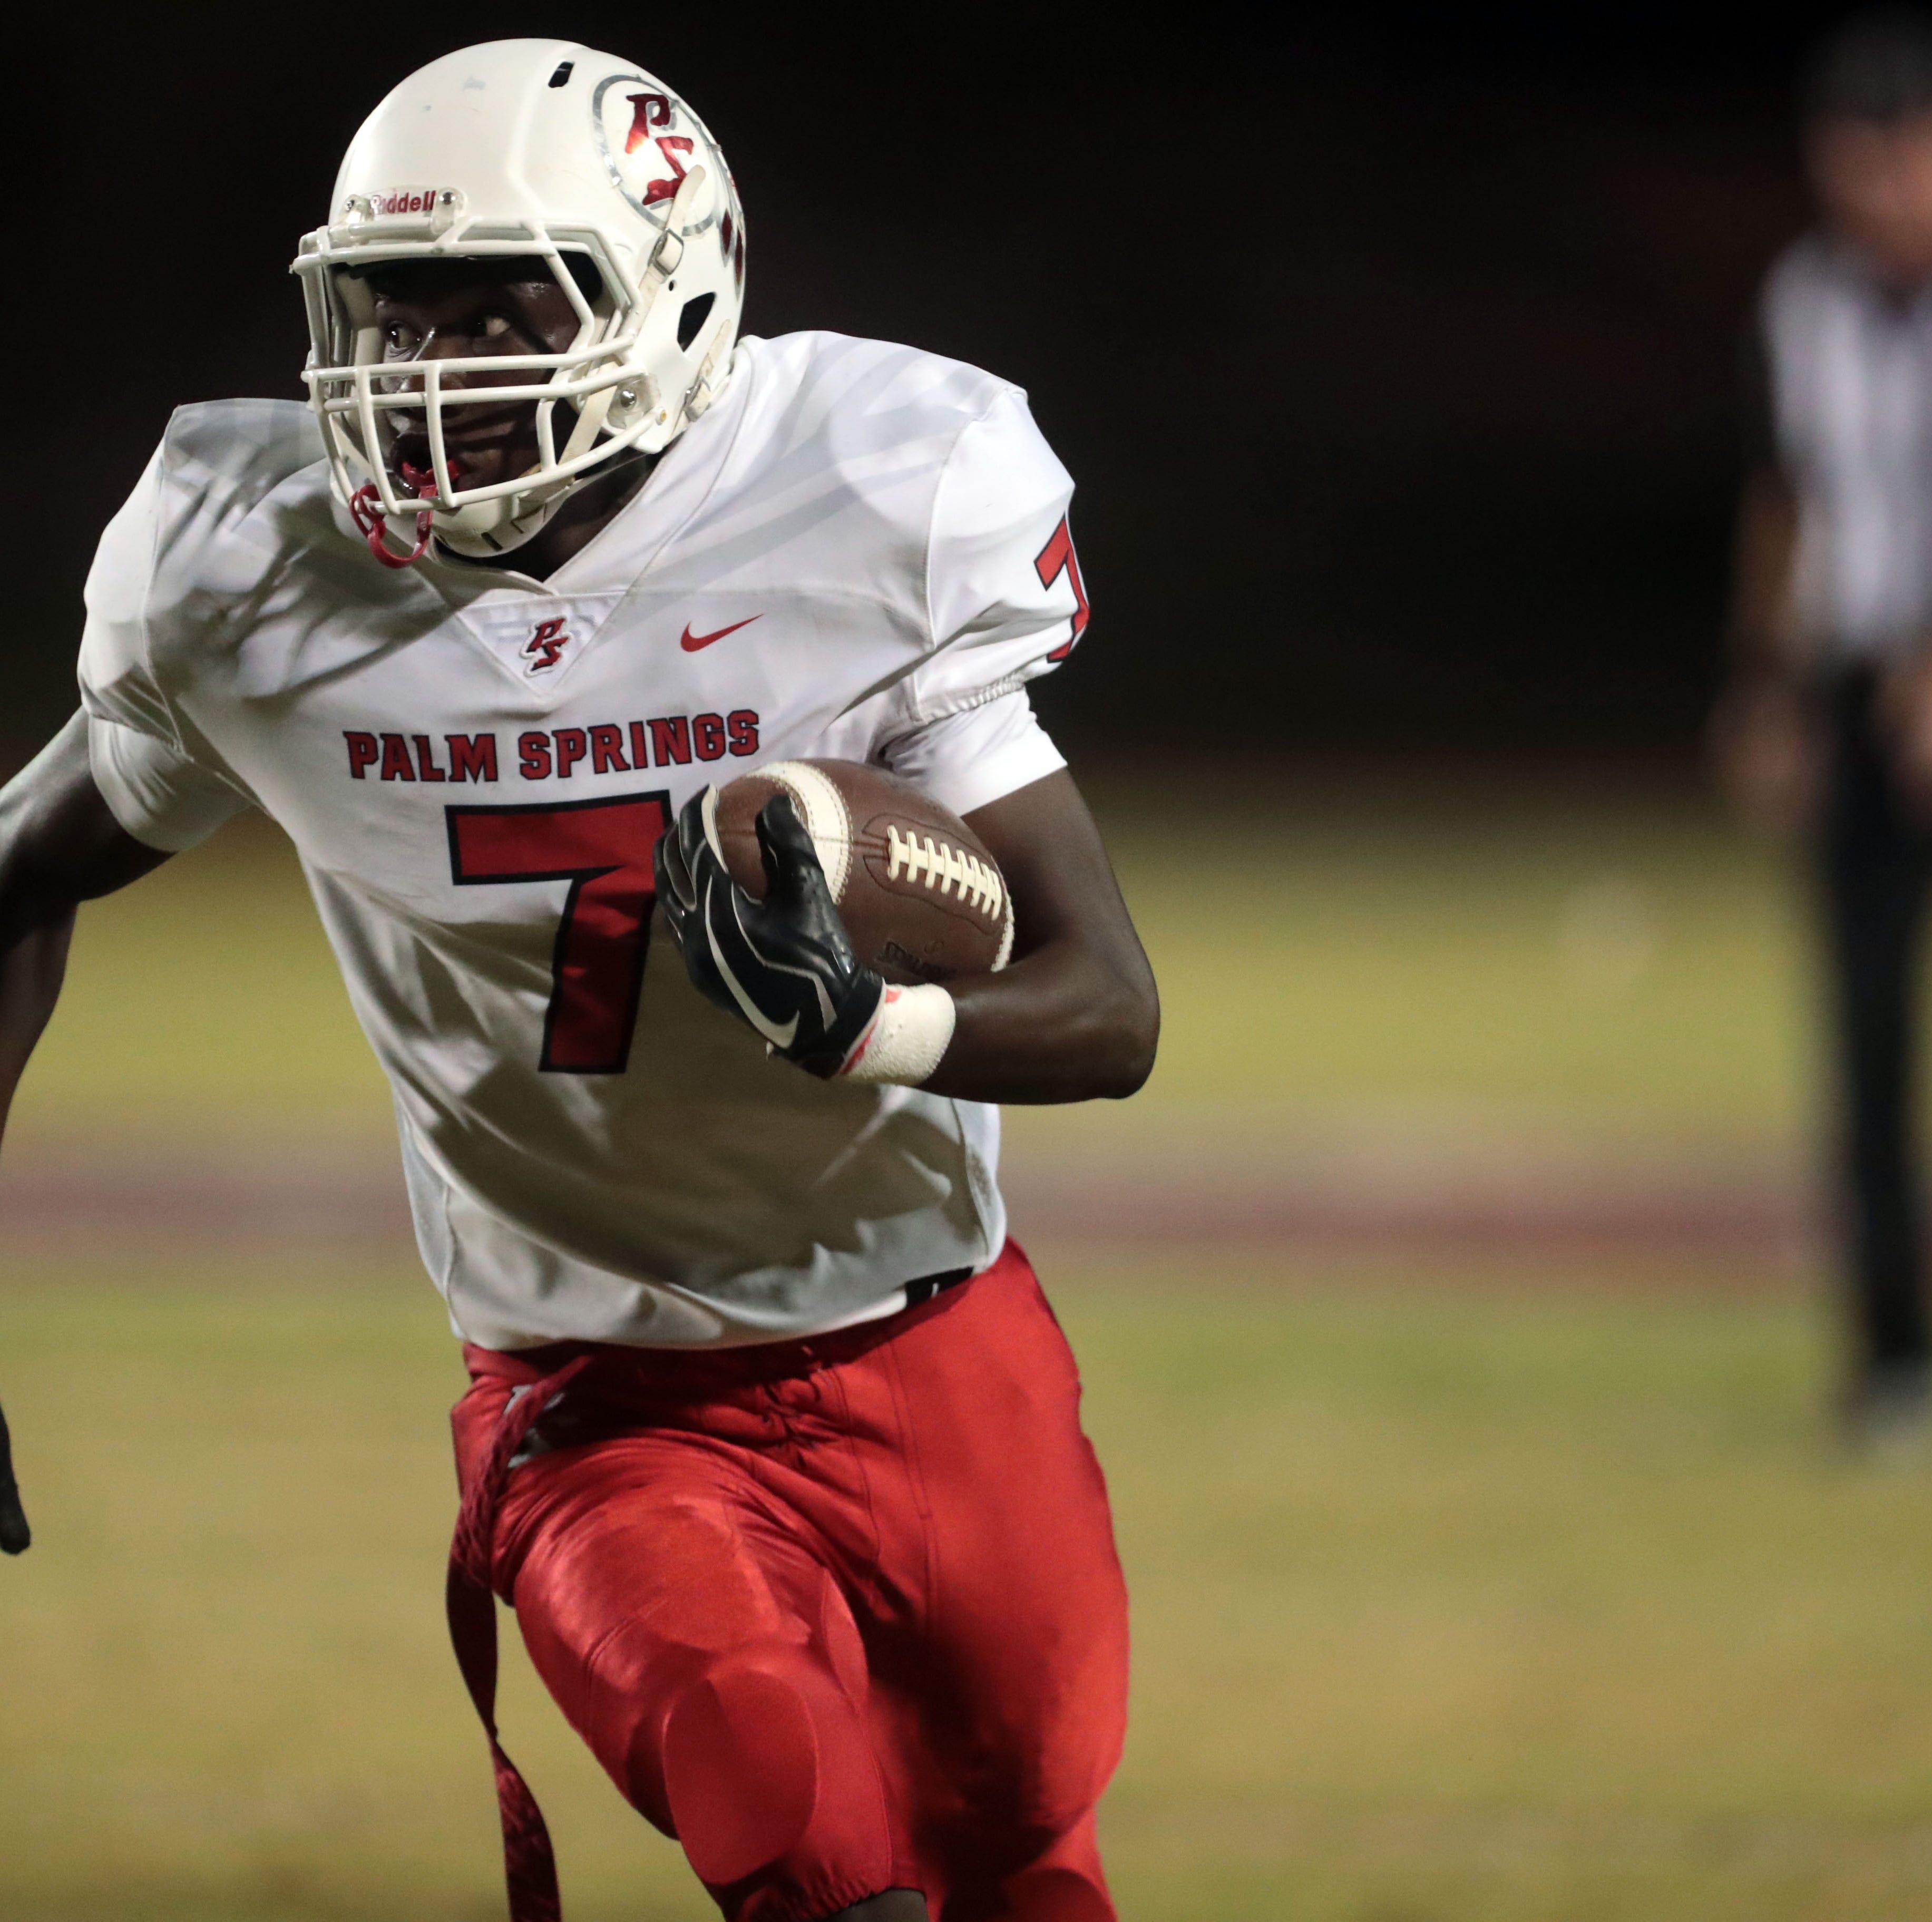 Friday's high school football scores: Coachella Valley, Palm Desert earn big wins